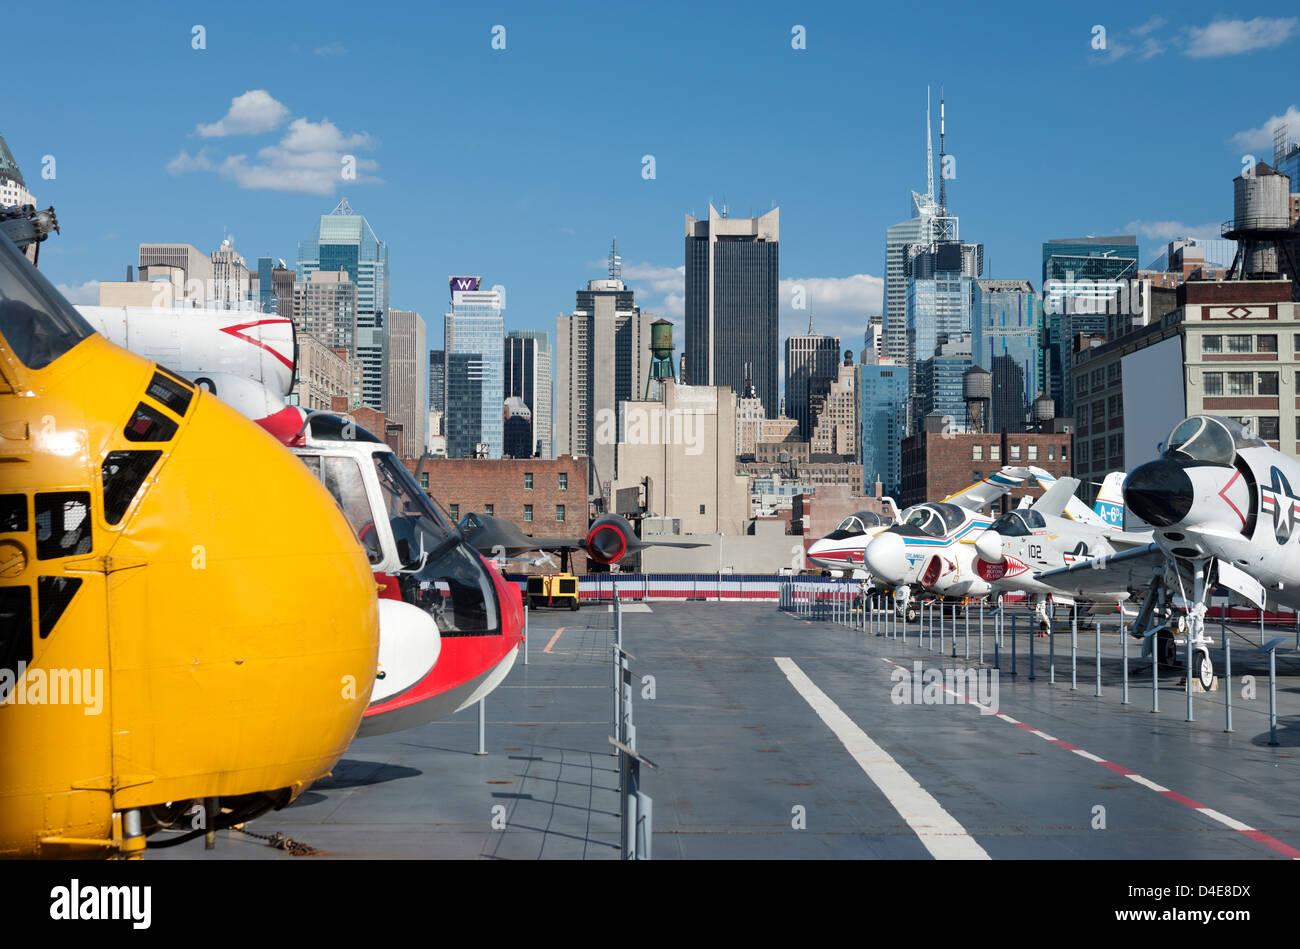 FLIGHT DECK OF INTREPID SEA AIR AND SPACE MUSEUM MANHATTAN NEW YORK CITY USA Stock Photo